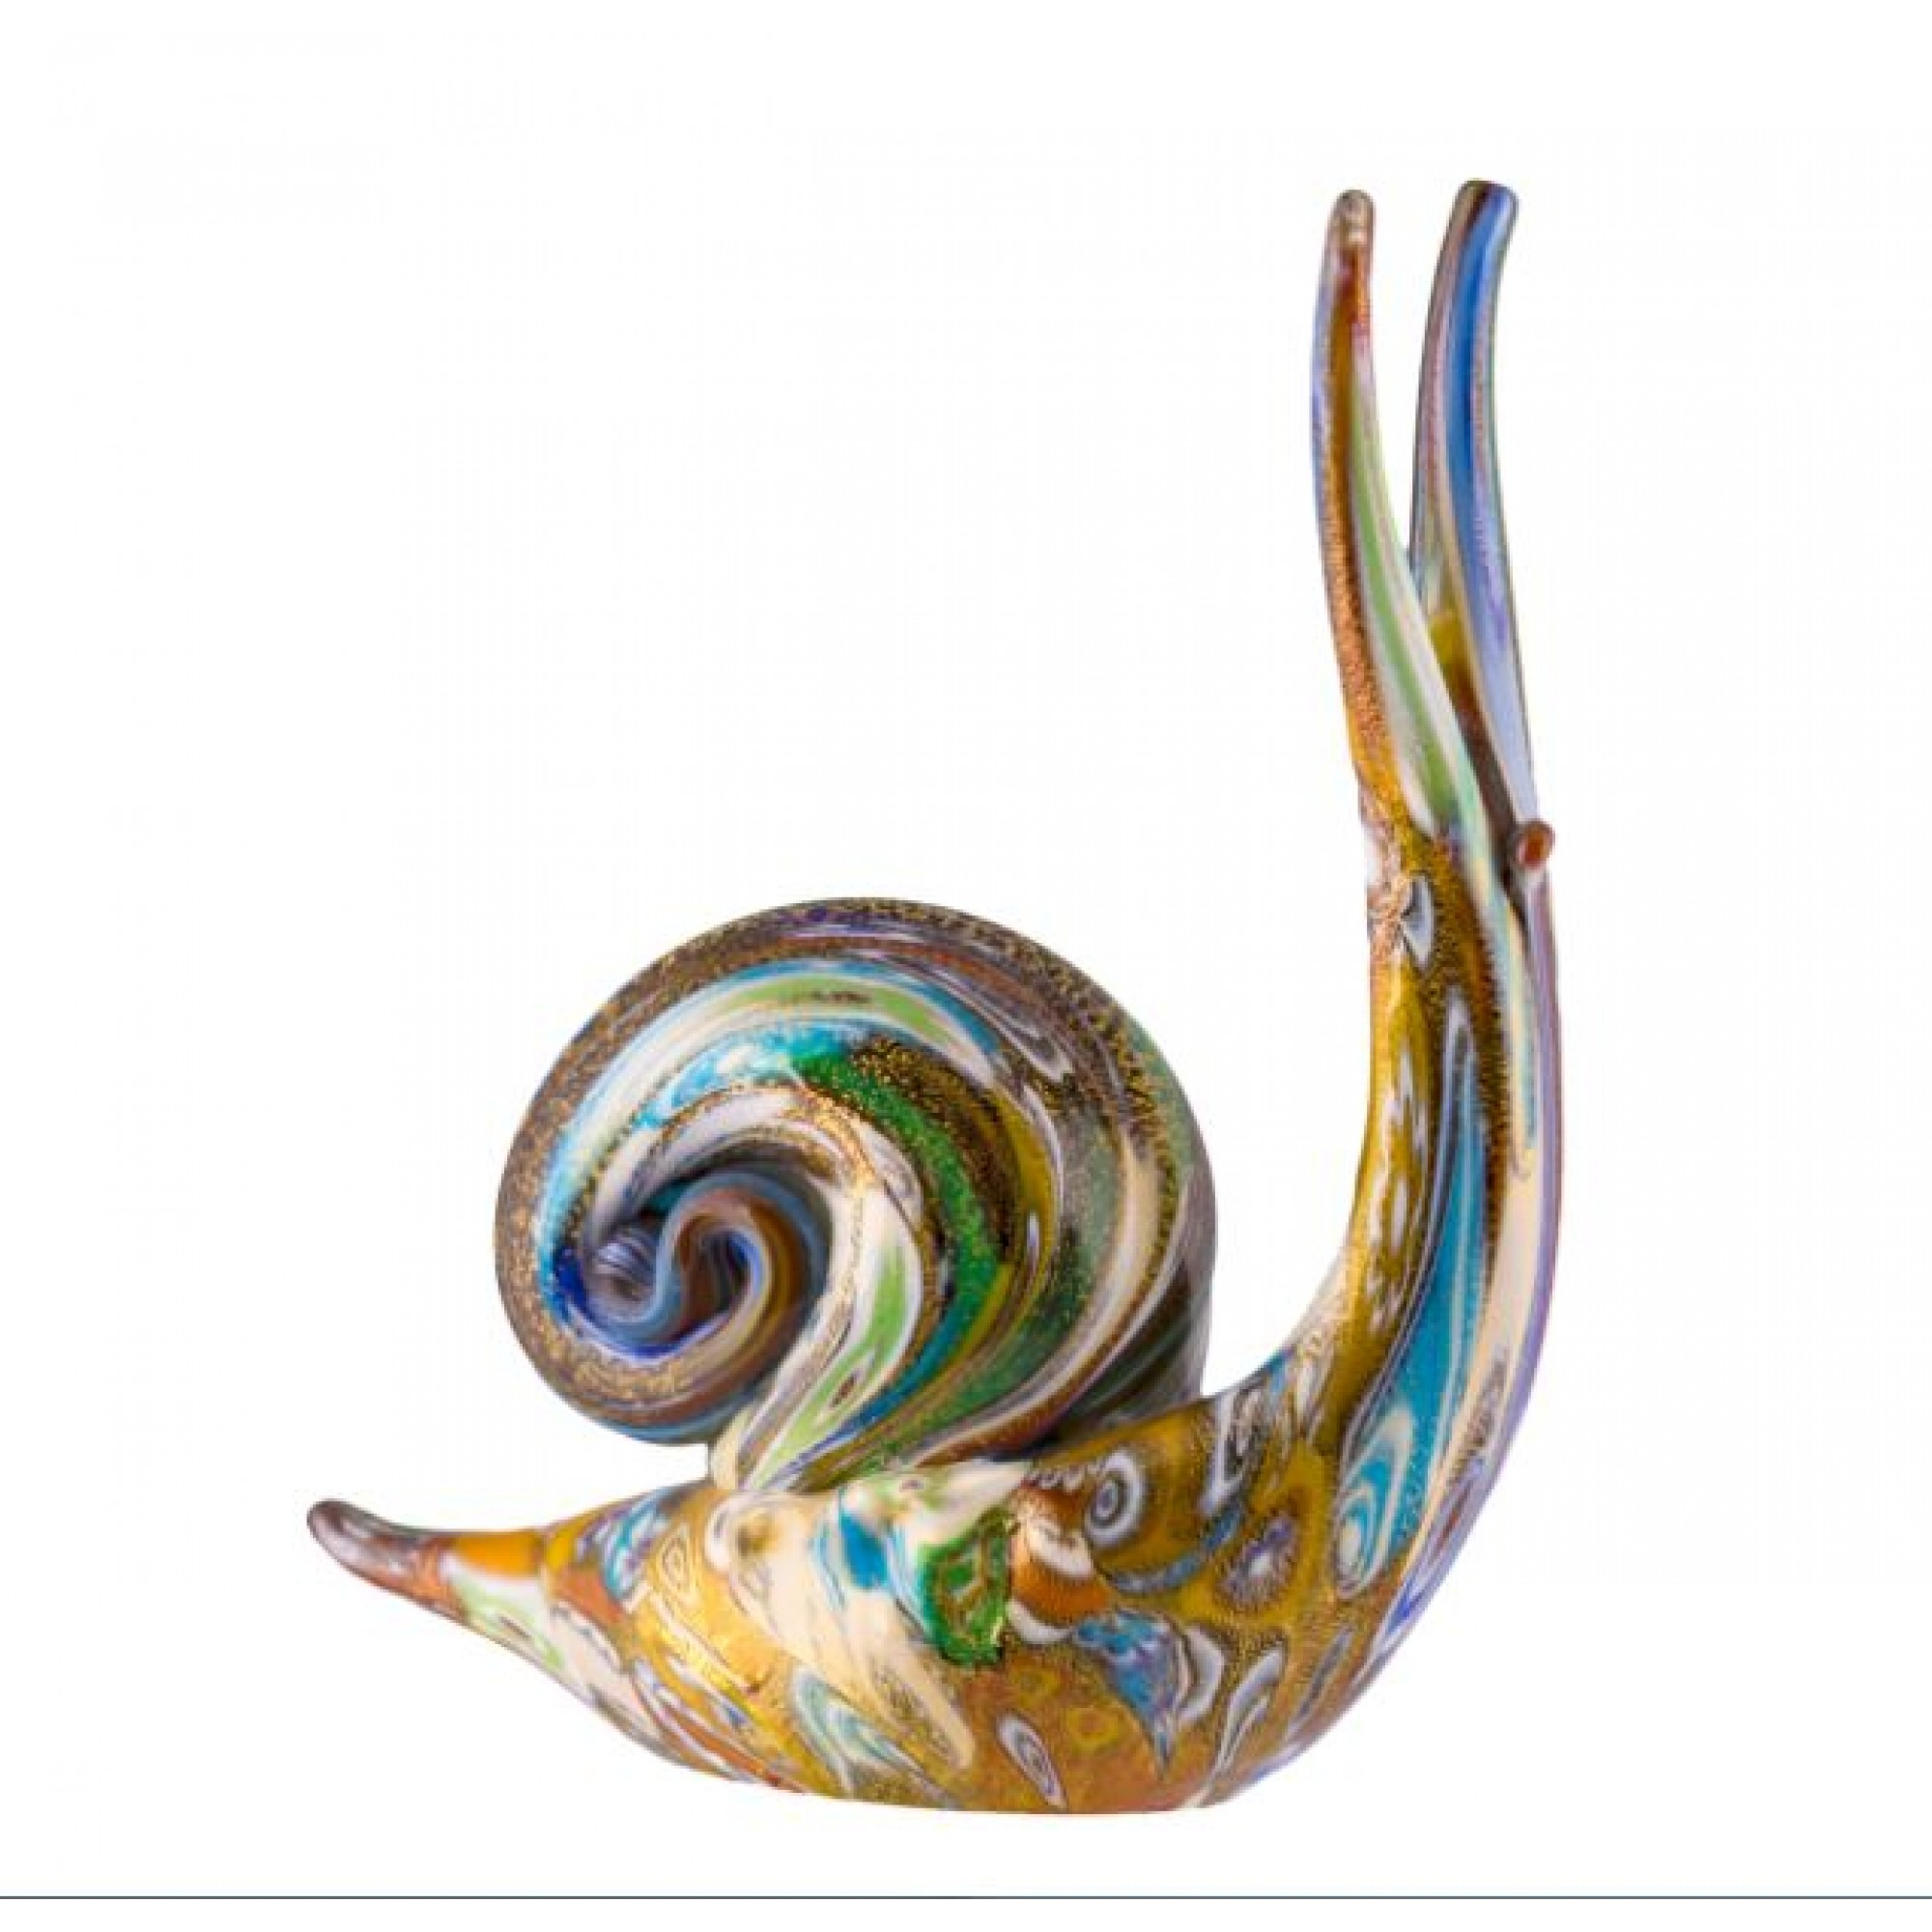 Animali Piccoli Snail - Murano Dekoratif Obje -  ARTE DI MURANO OBJE